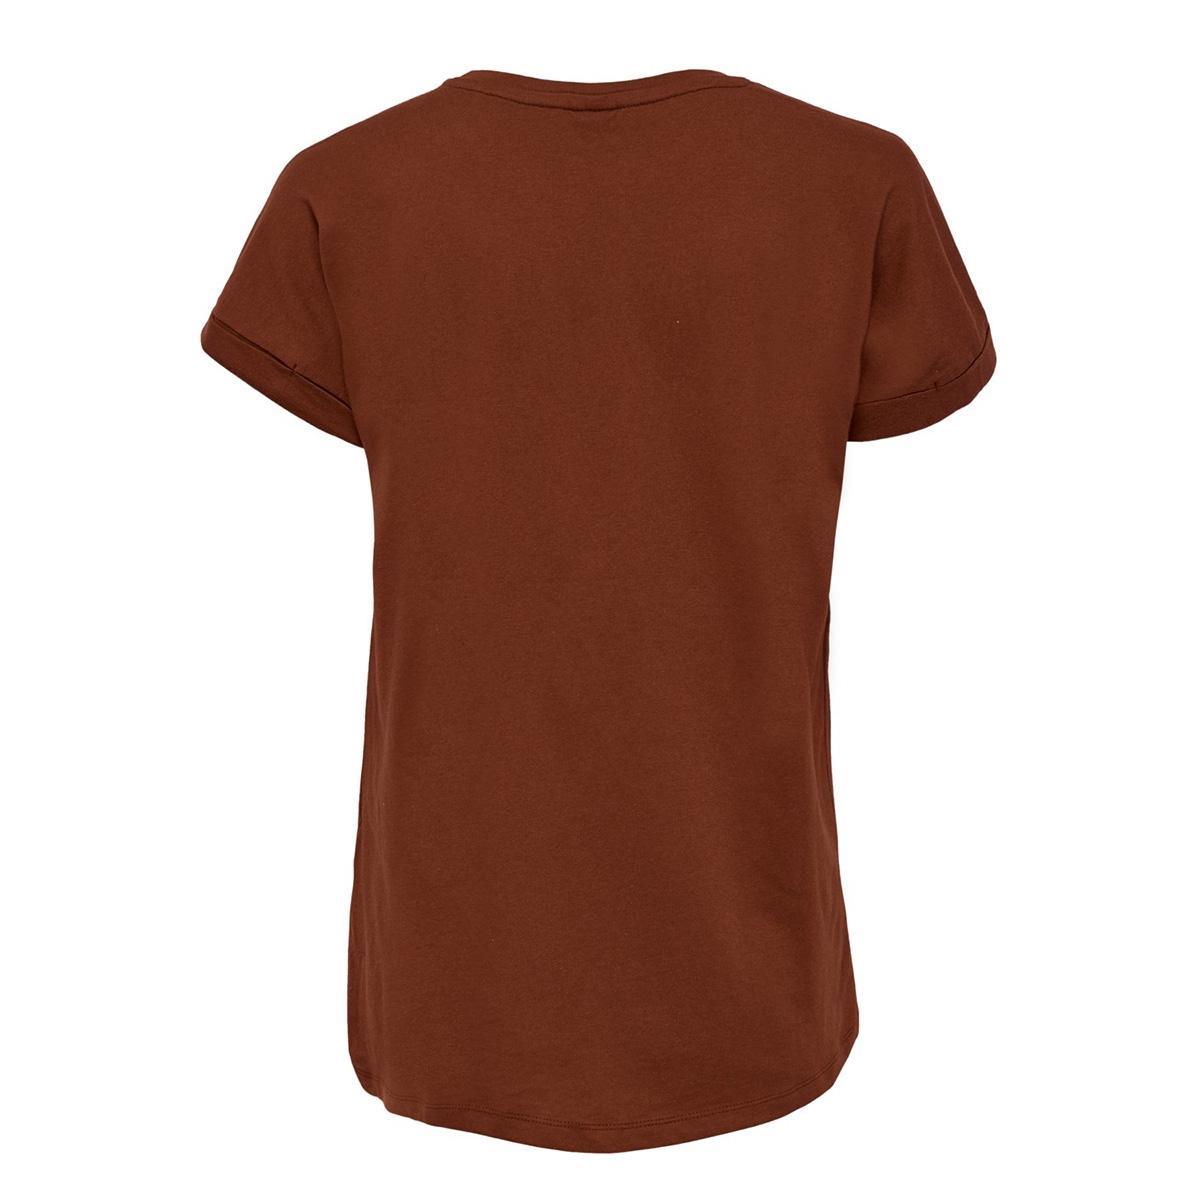 jdylouisa s/s fold up top jrs noos 15157925 jacqueline de yong t-shirt smoked paprika